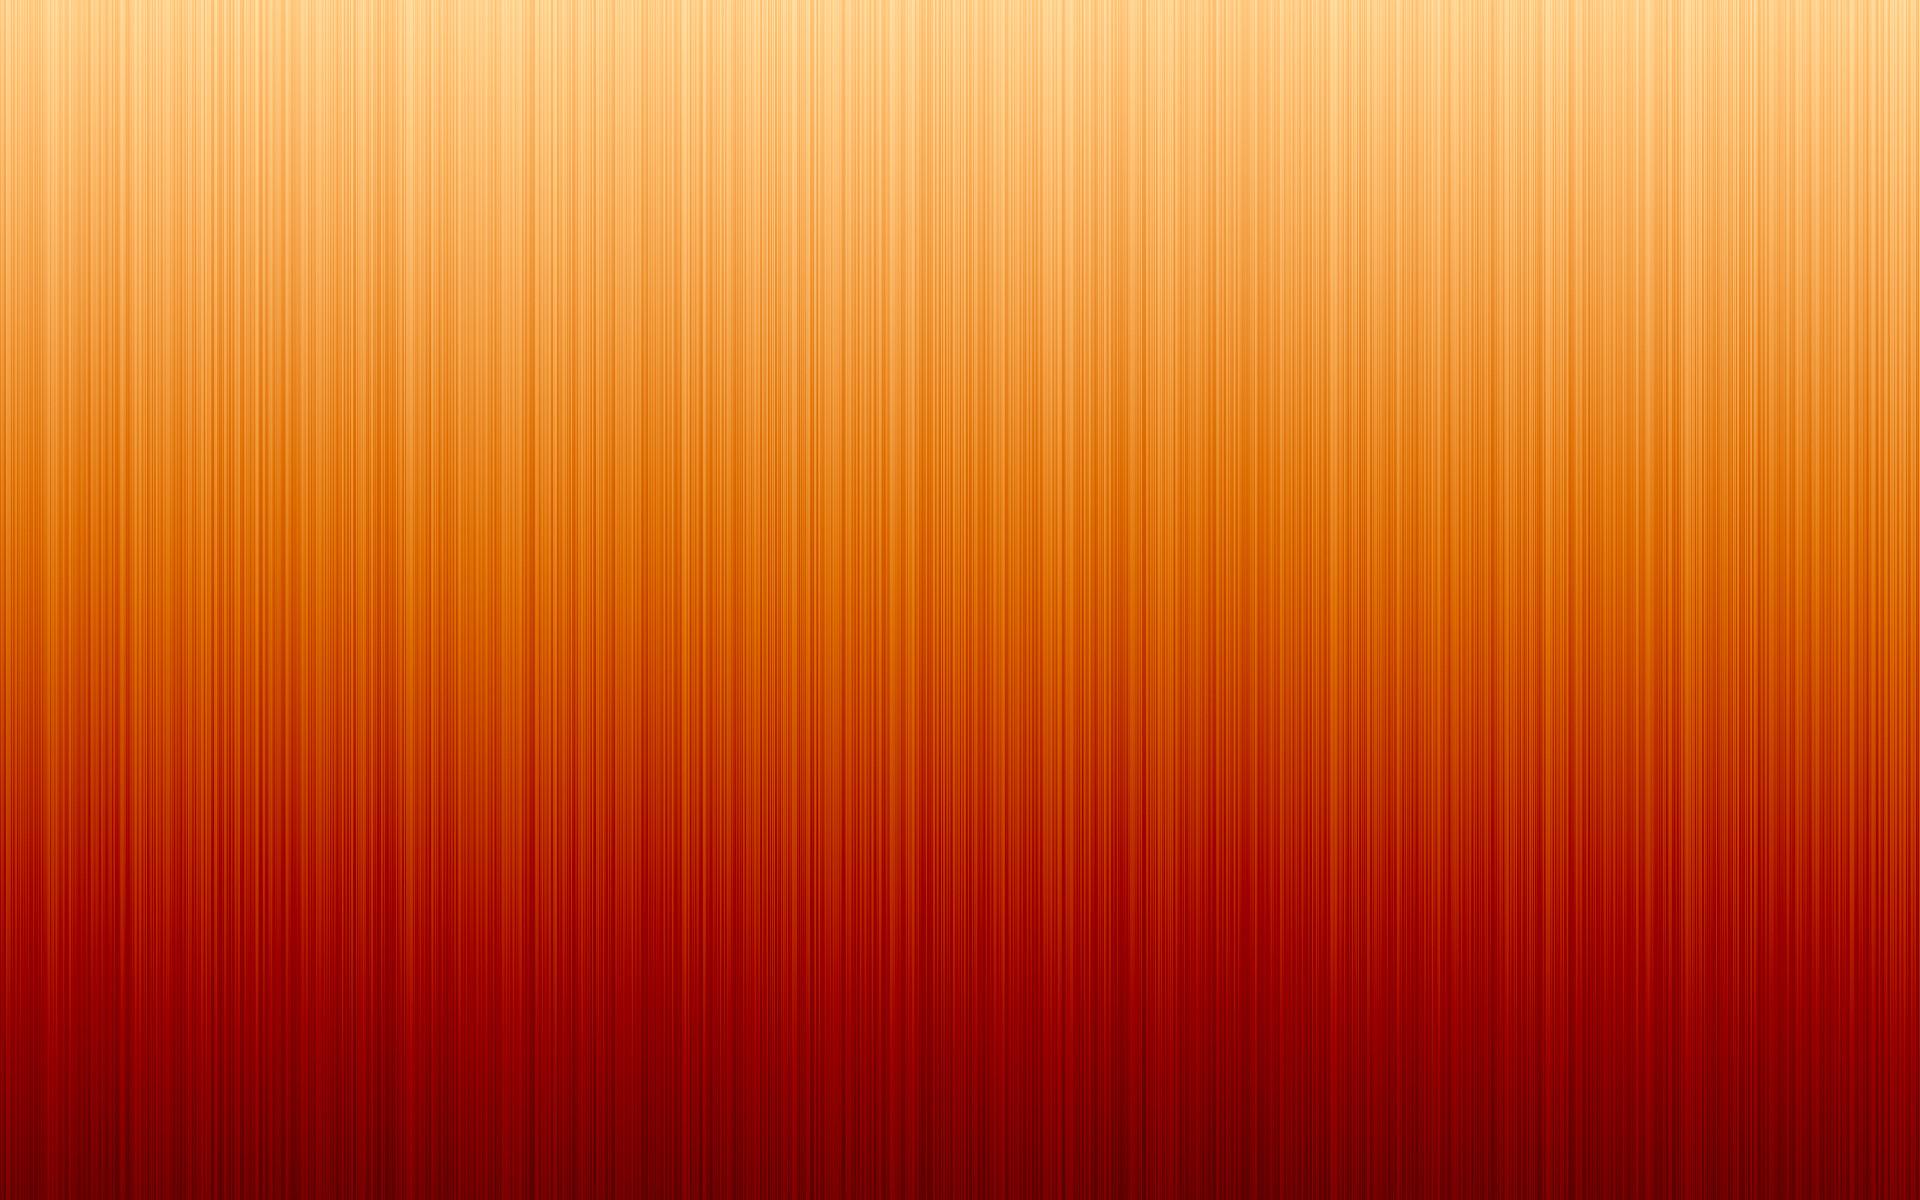 Orange Wallpaper 20